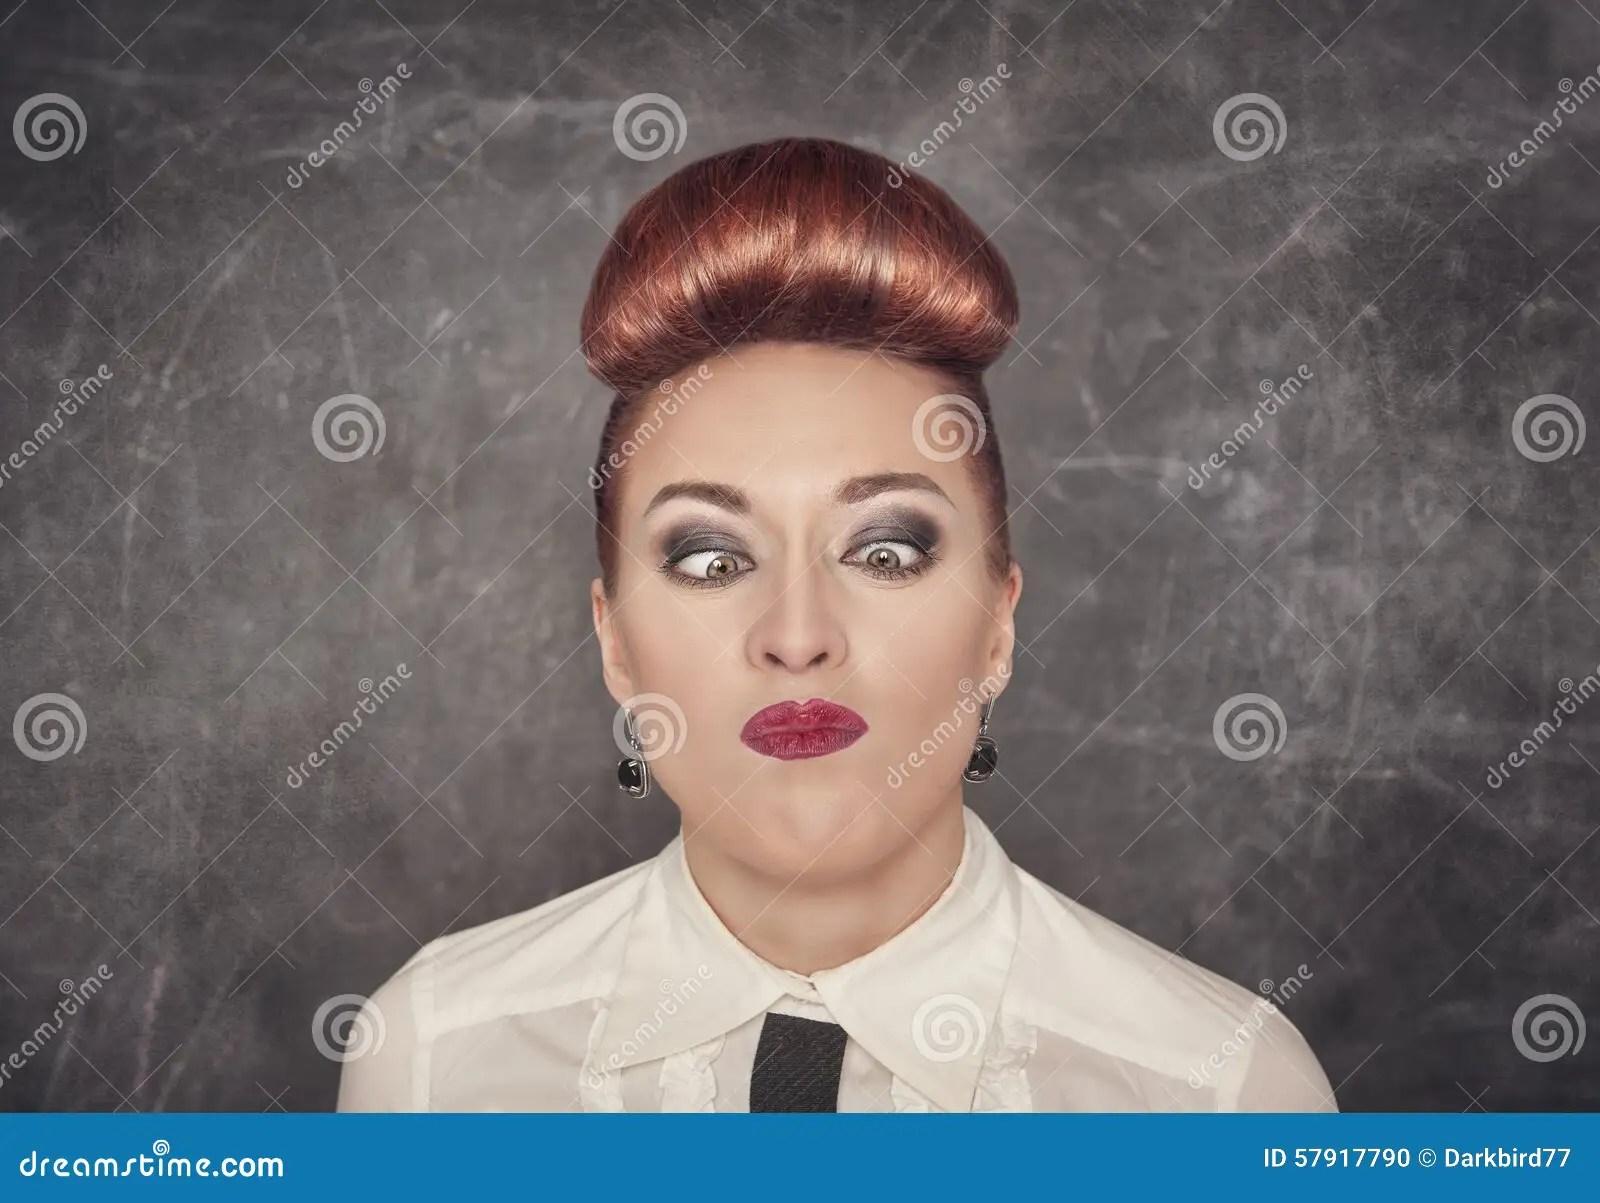 Crazy Teacher With Eyes Crossed Stock Photo